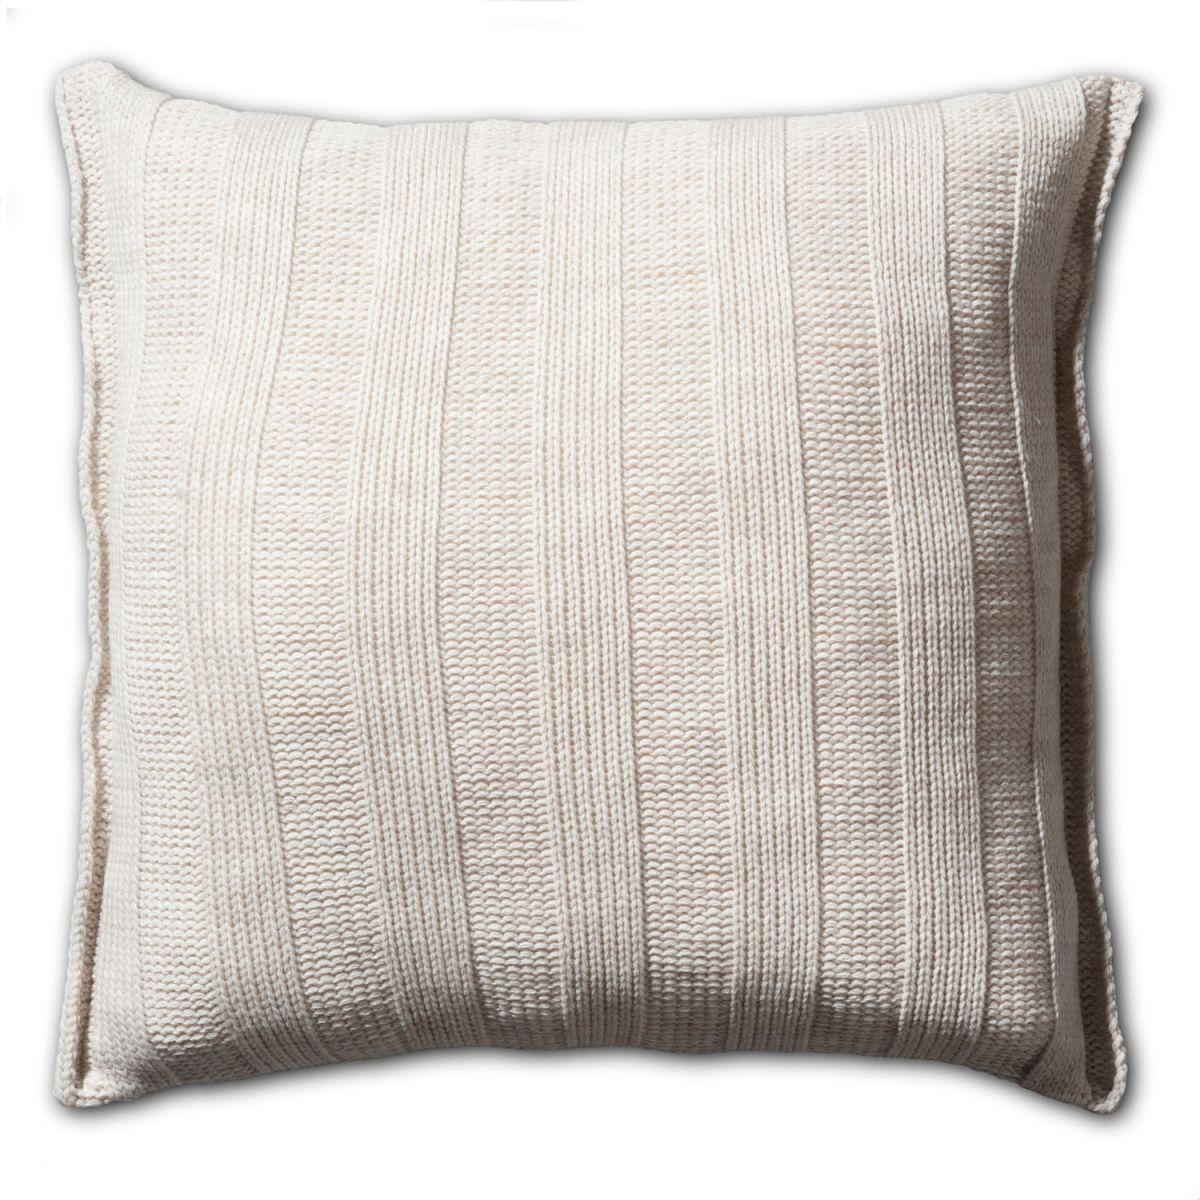 6x6 rib cushion beige 50x50